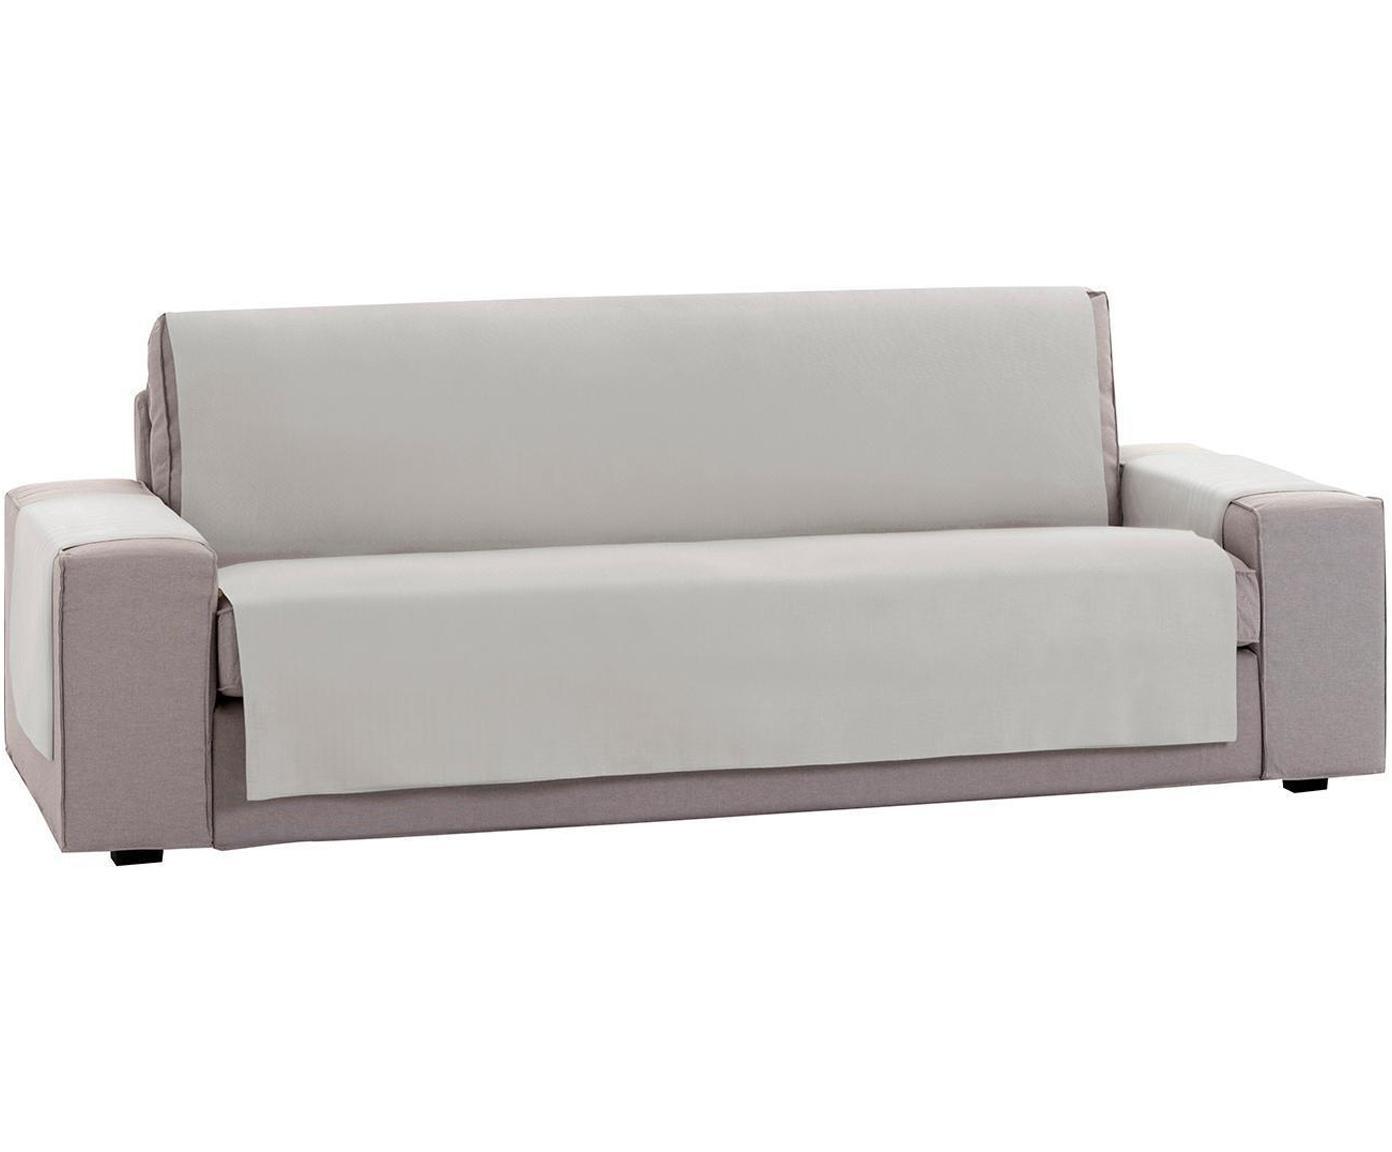 Funda de sofá Levante, 50%algodón, 50%poliéster, Gris verdoso, 2 plazas (115 x 220cm)